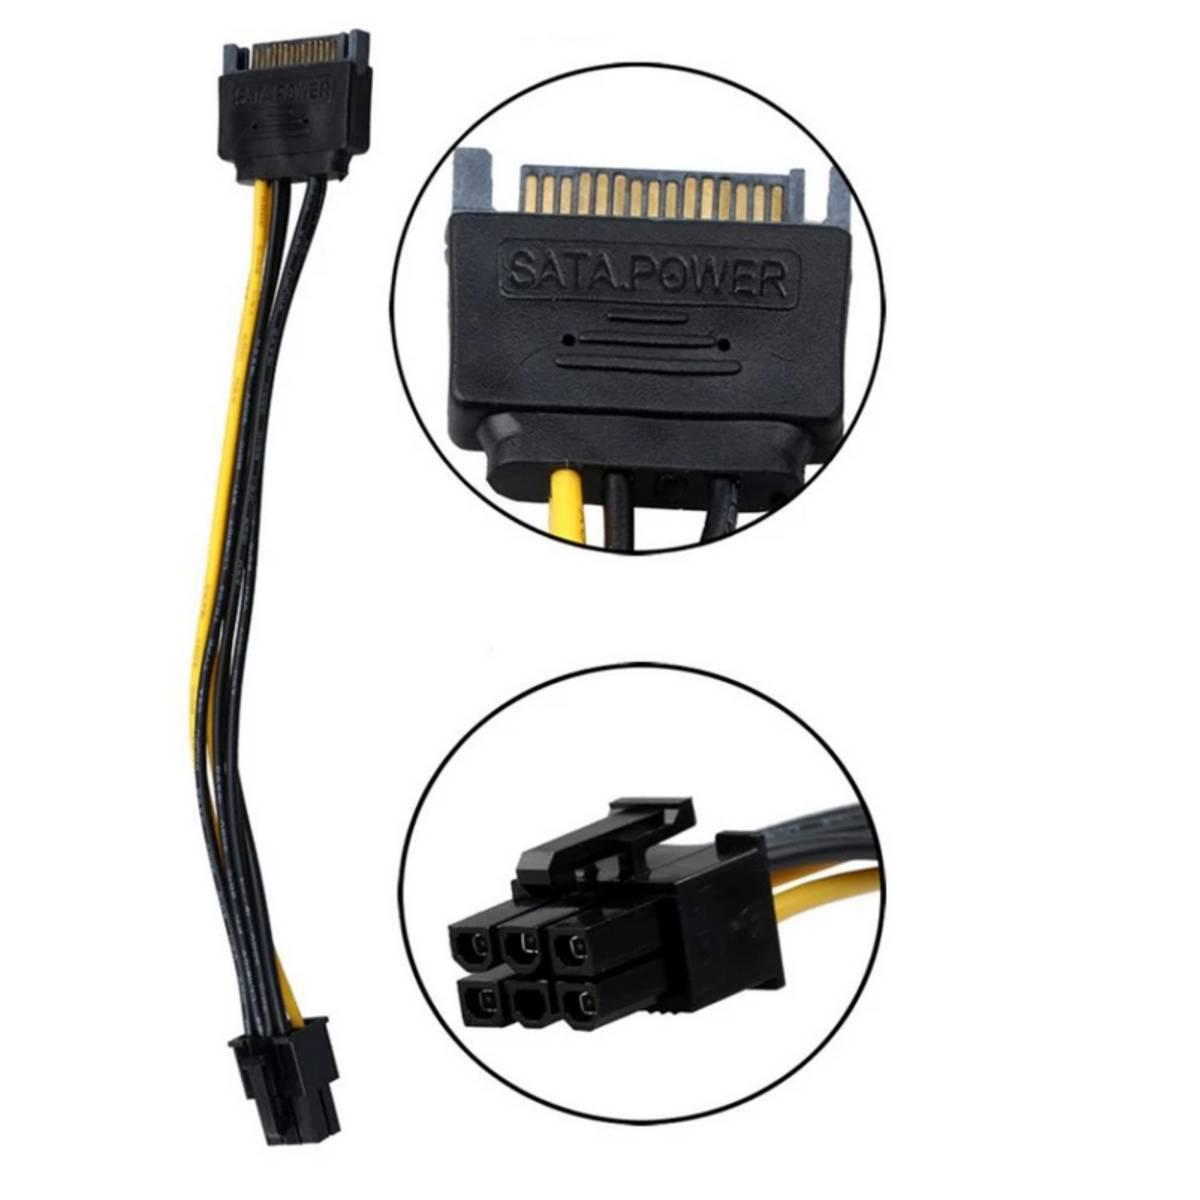 SATA Power Cable 15 Pin To 6 Pin PCI EXPRESS PCI-E Sata Graphics Converter Adapter Video Card Power Cable